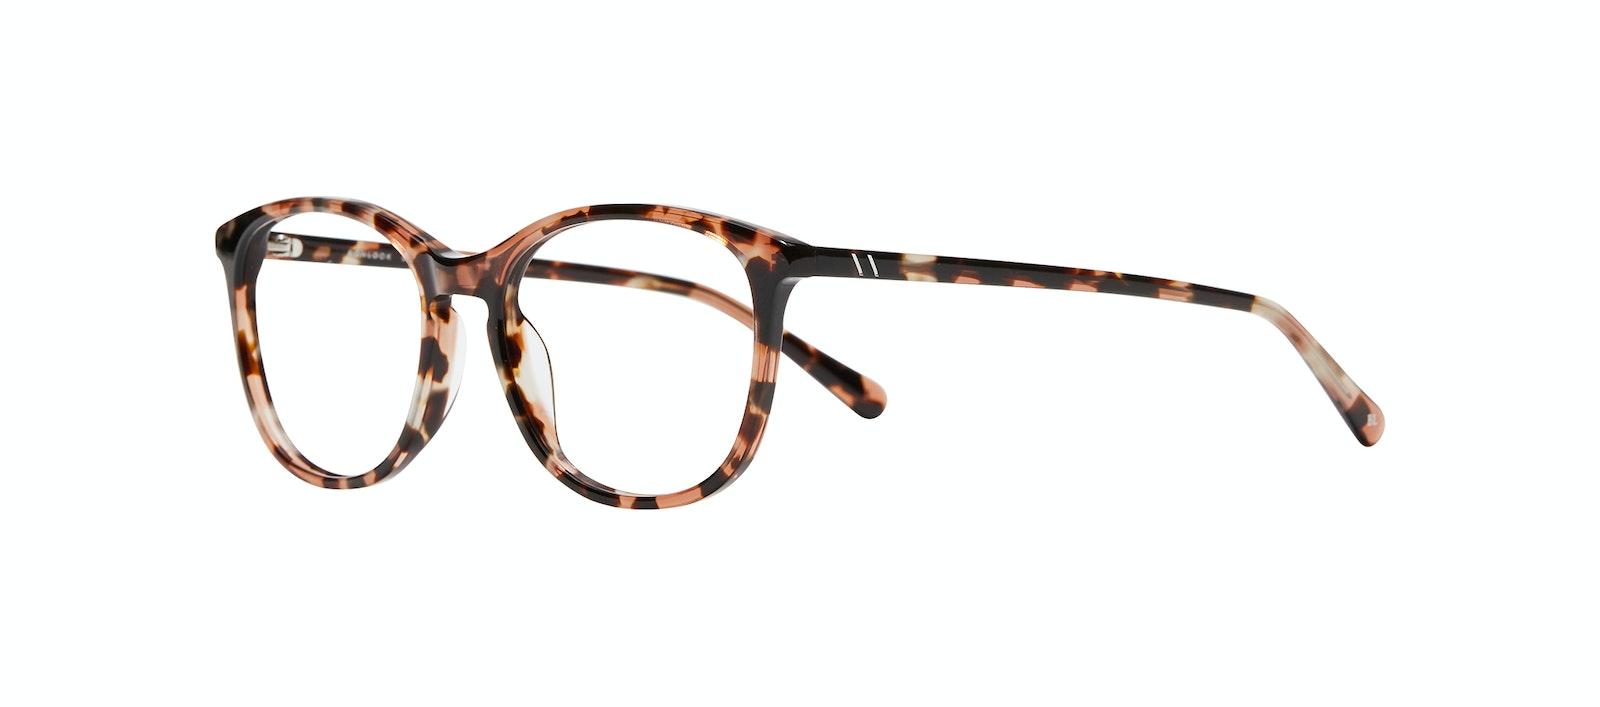 Affordable Fashion Glasses Rectangle Square Round Eyeglasses Women Nadine S Pink Tortoise Tilt